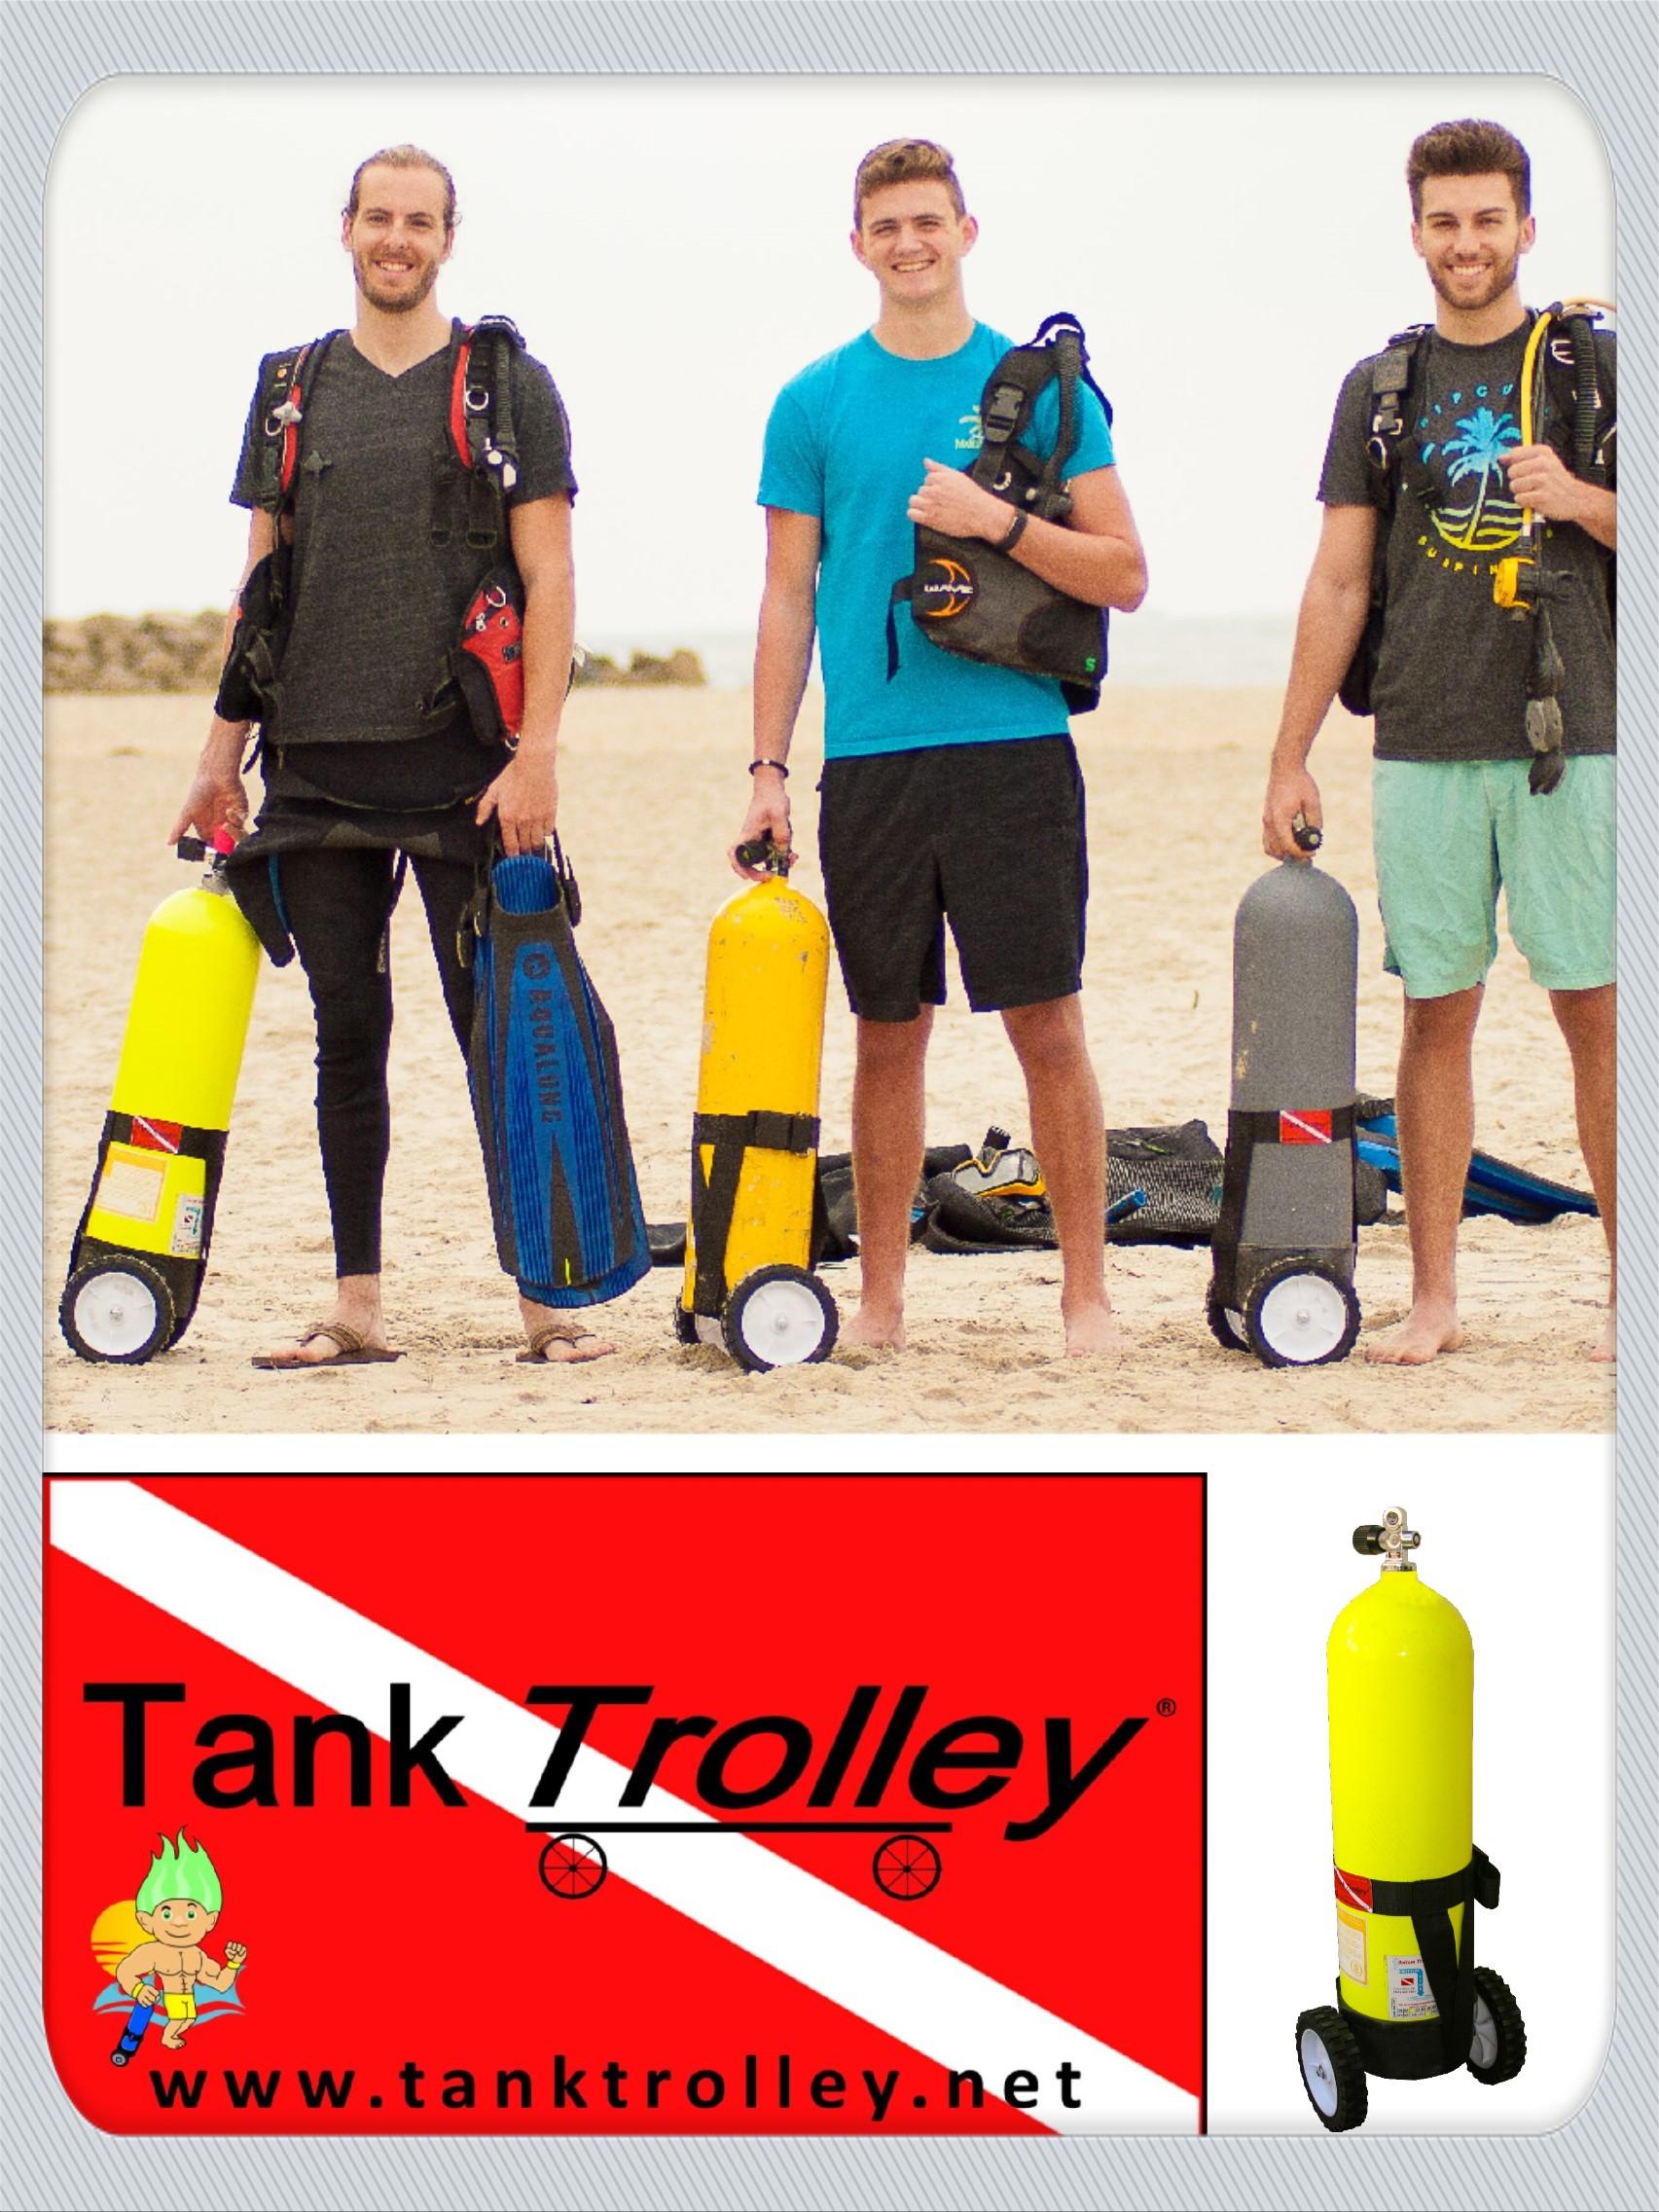 visit www.tanktrolley.net for more info